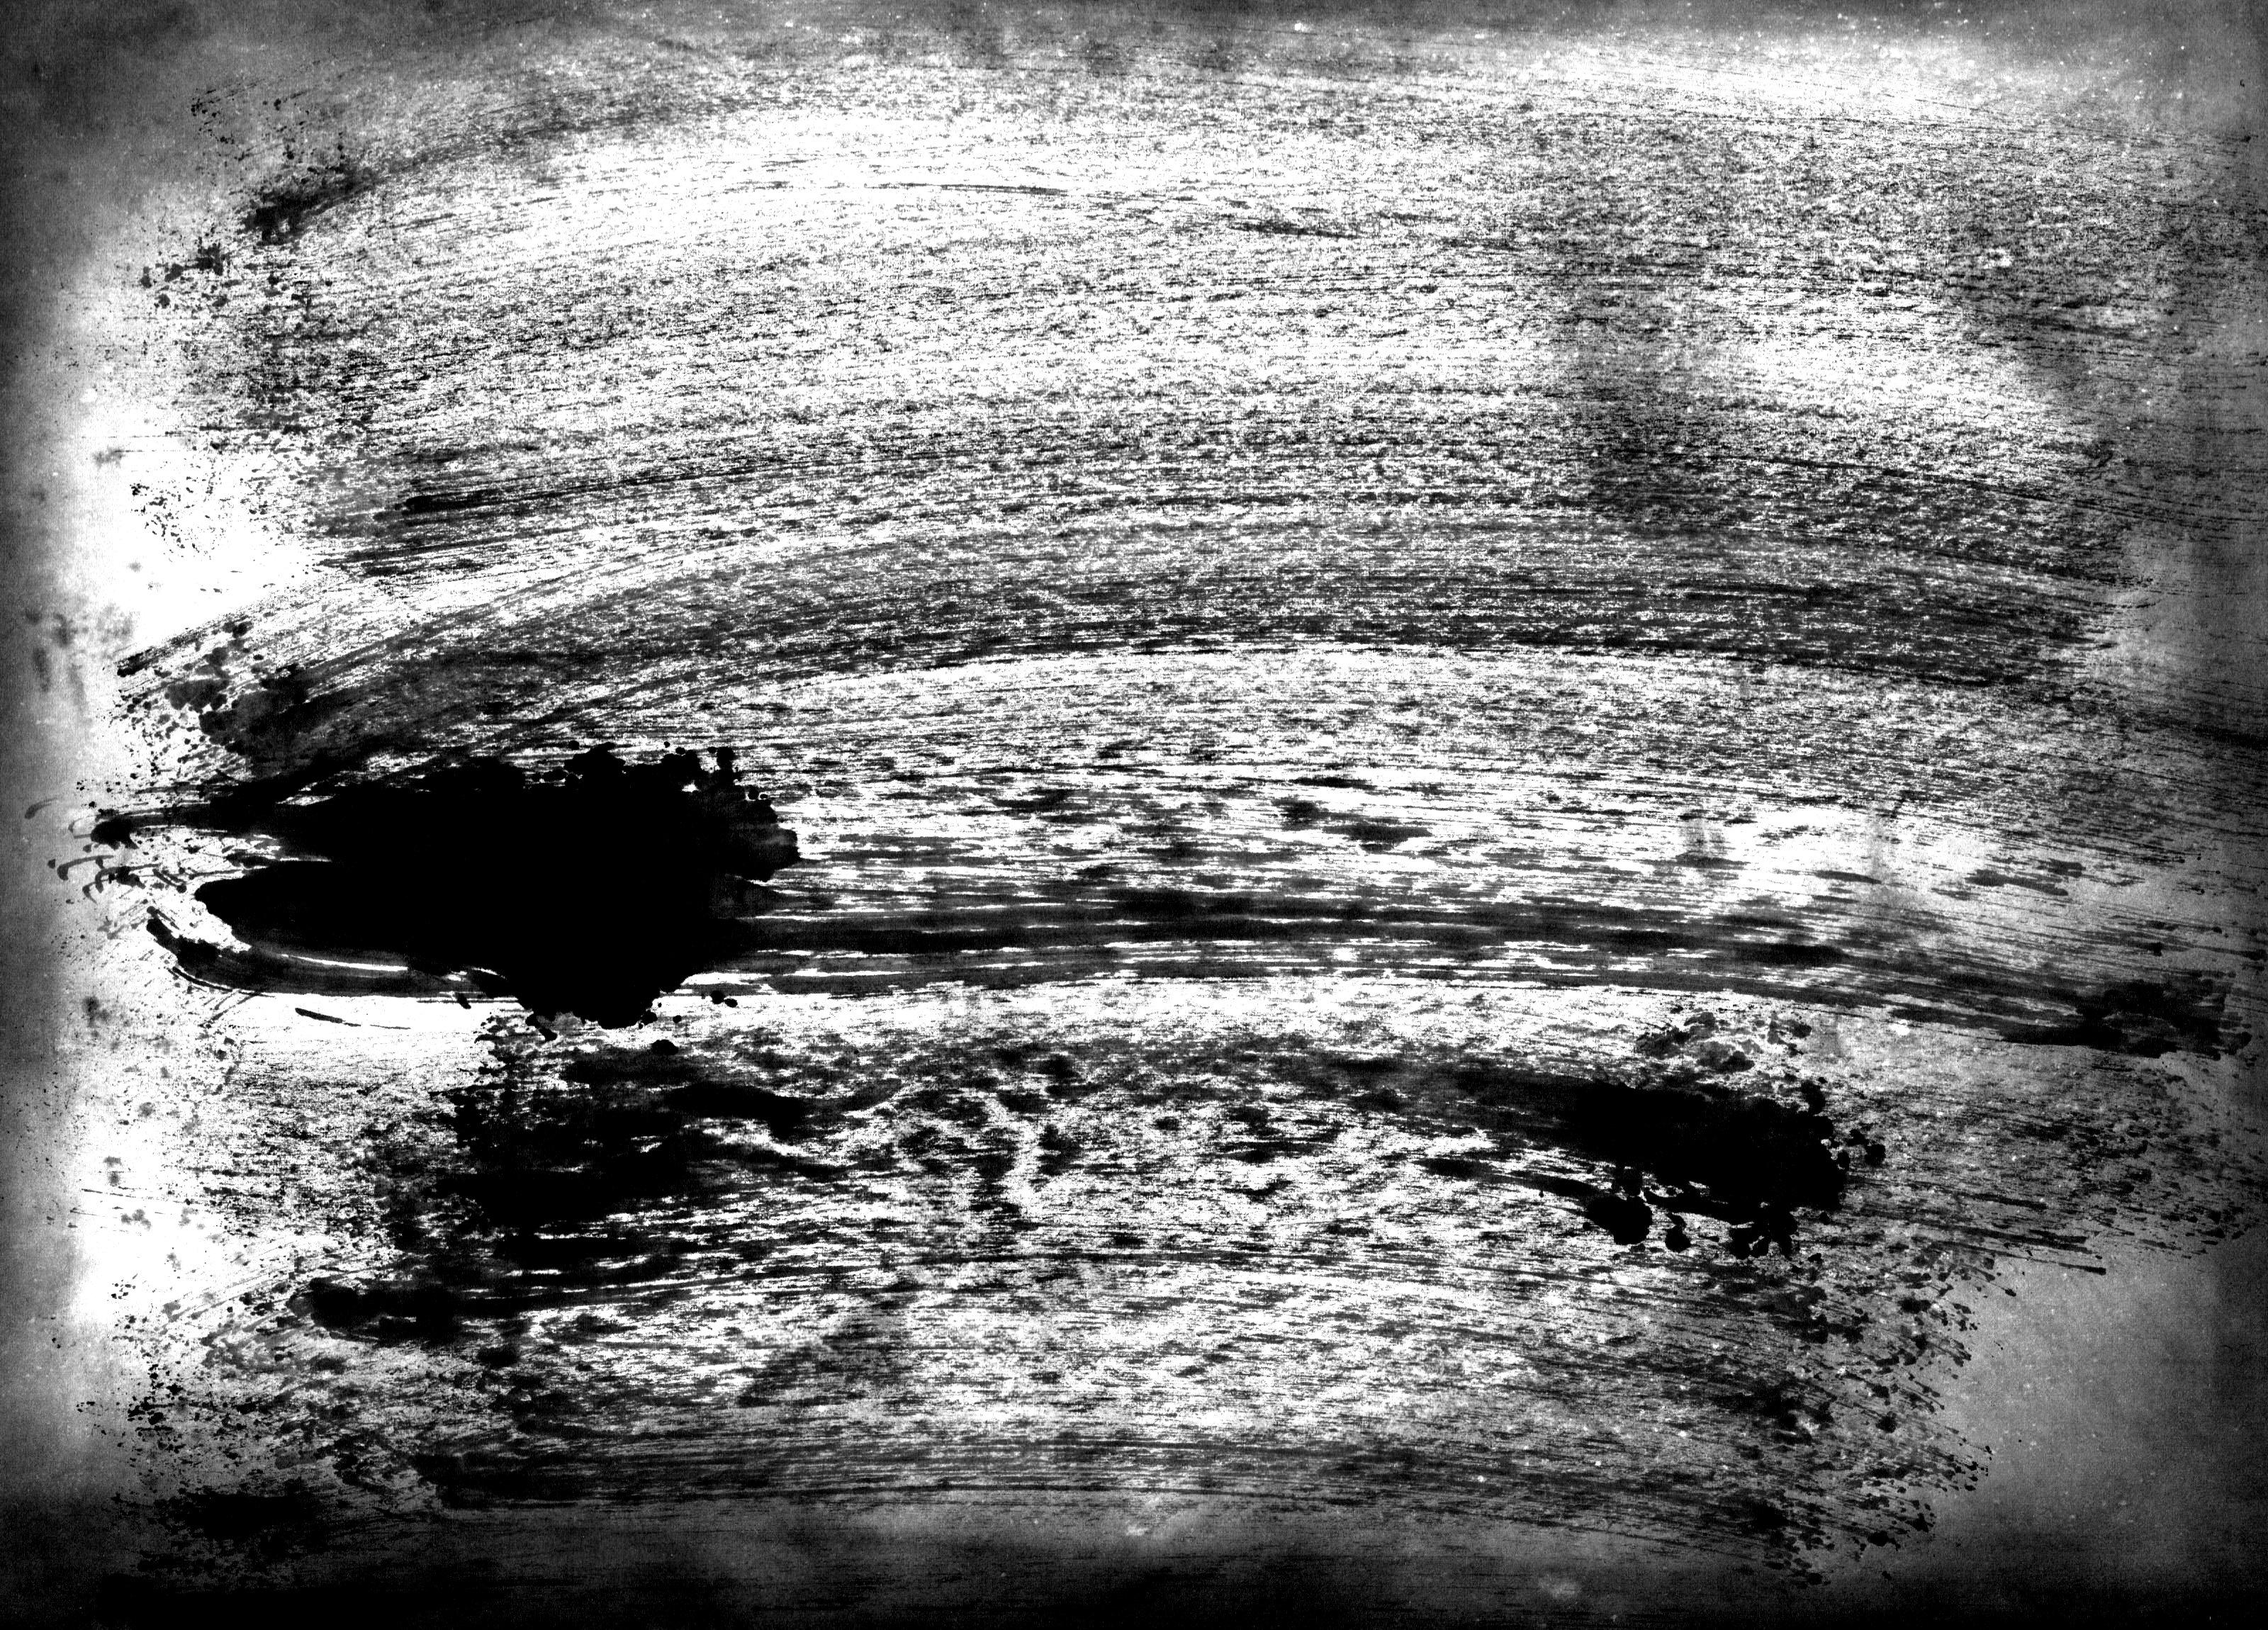 10 Grunge Texture Black and White (JPG)   OnlyGFX.com